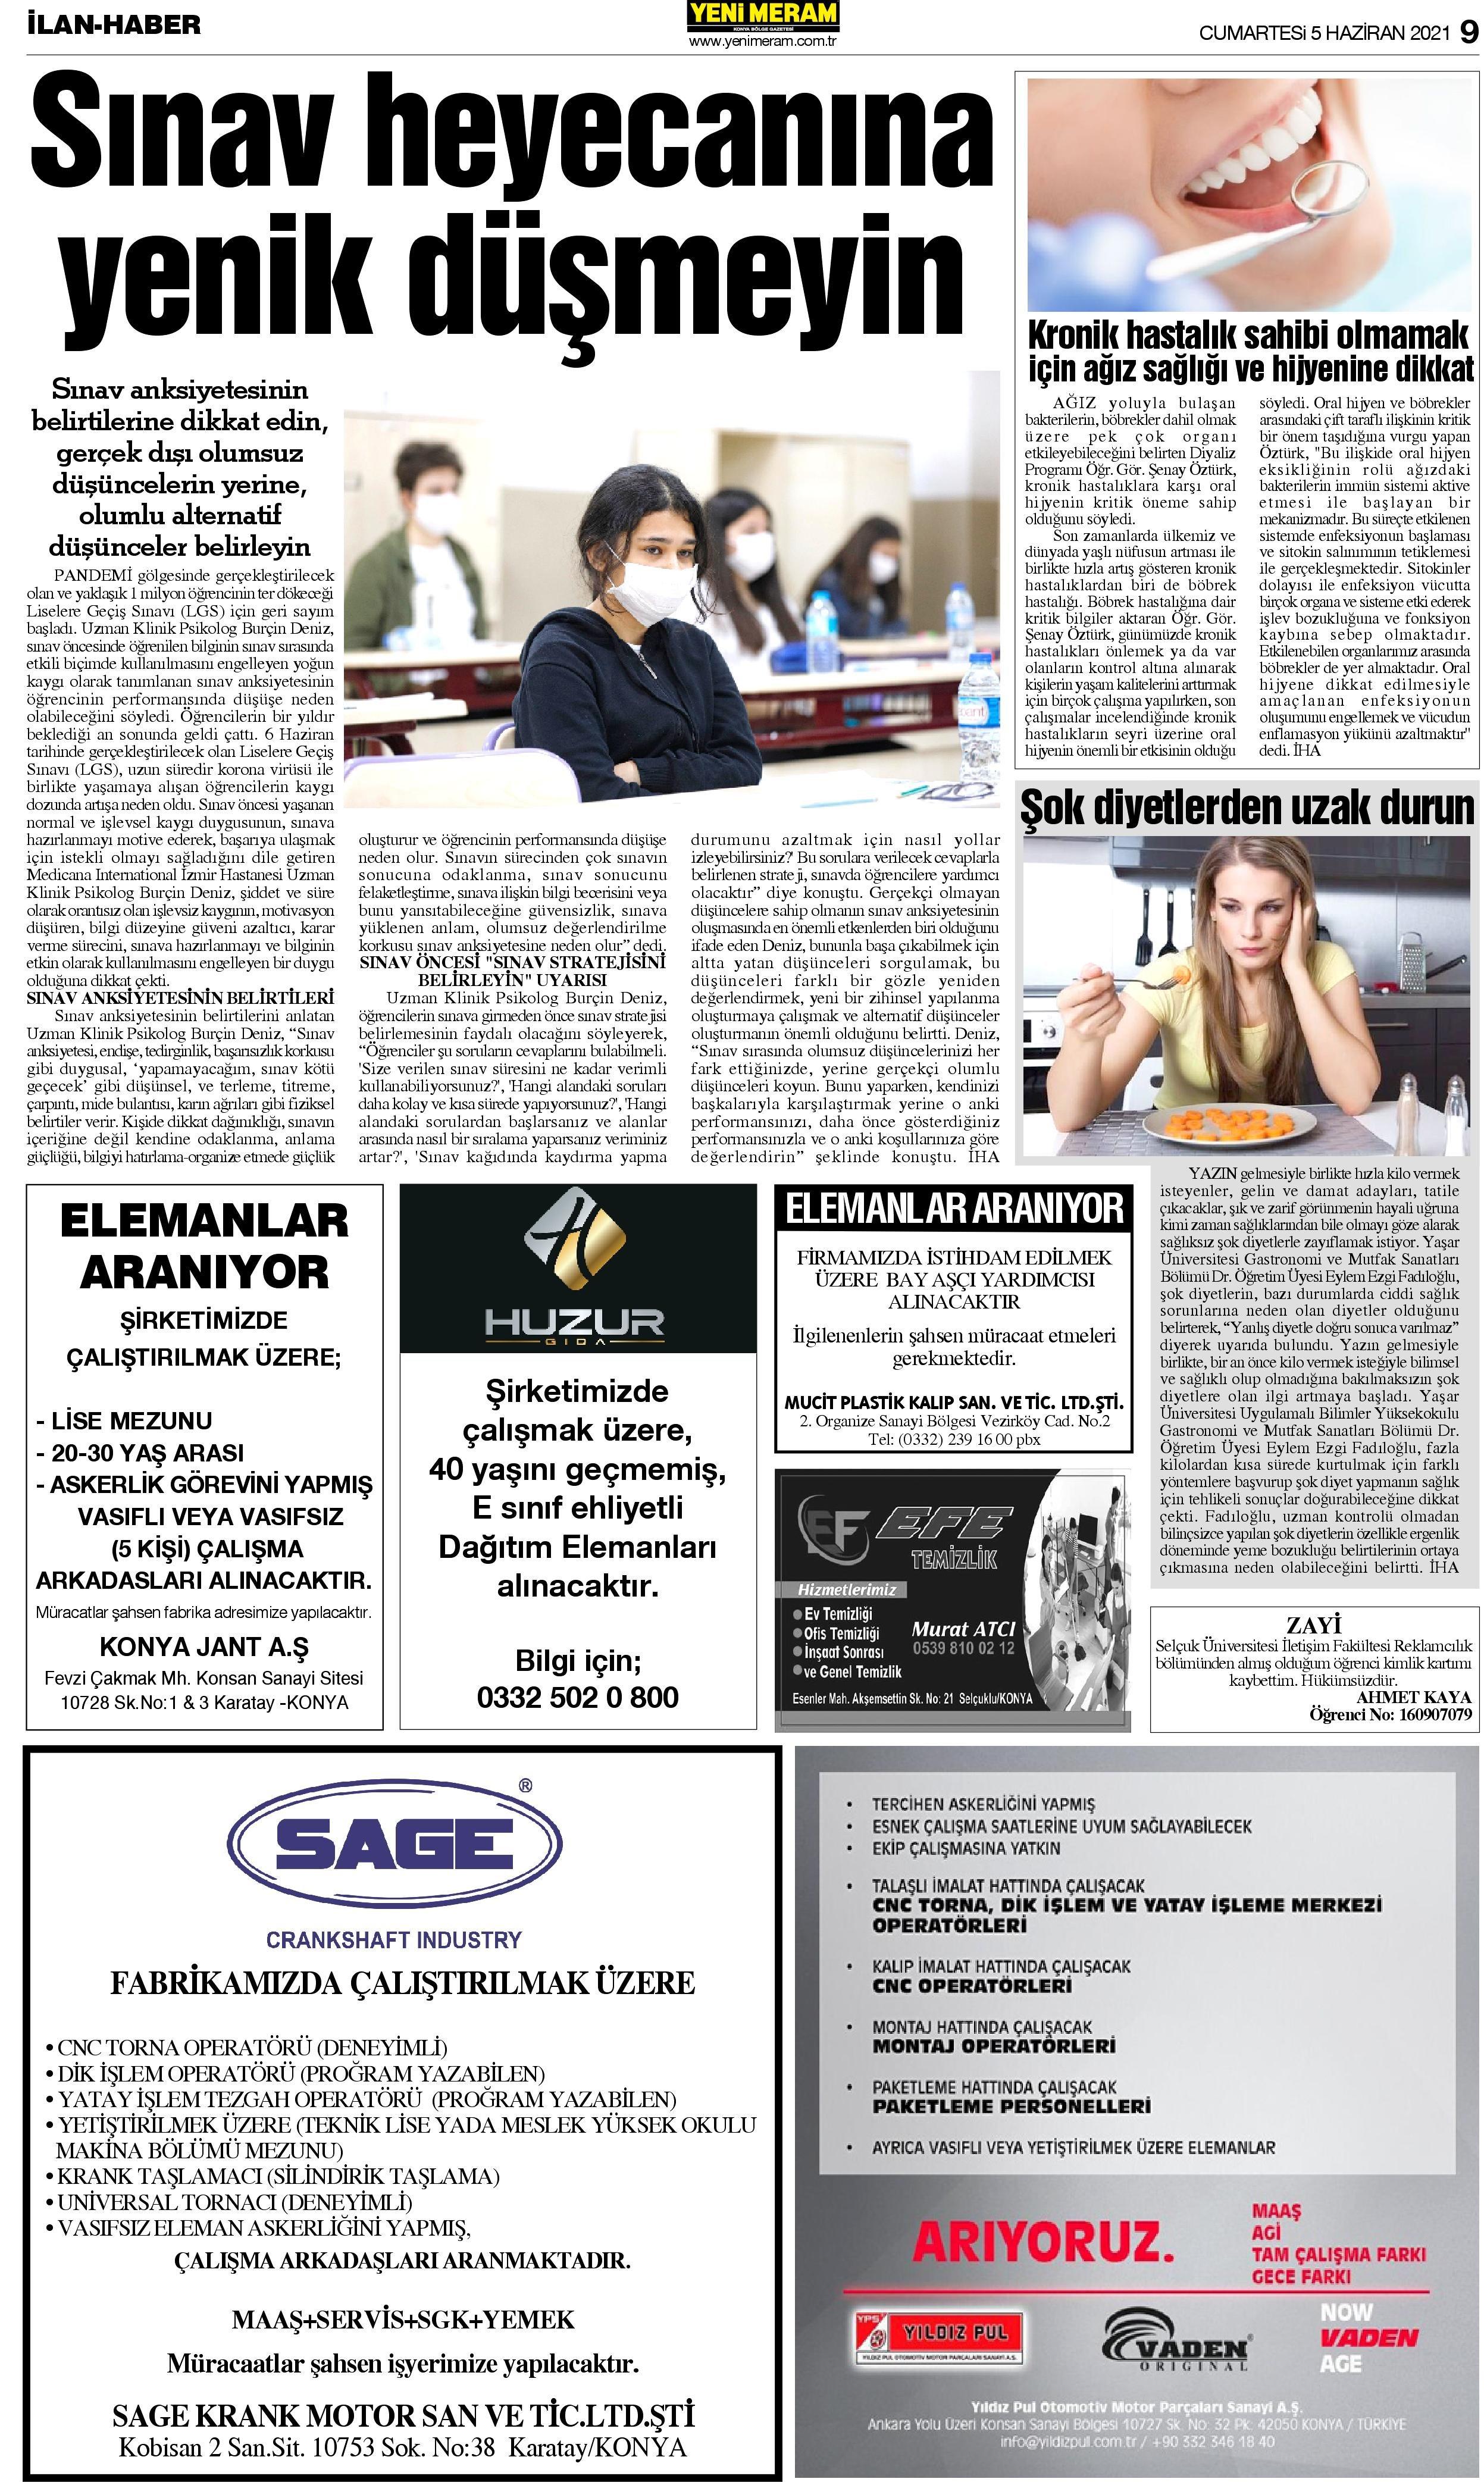 5 Haziran 2021 Yeni Meram Gazetesi